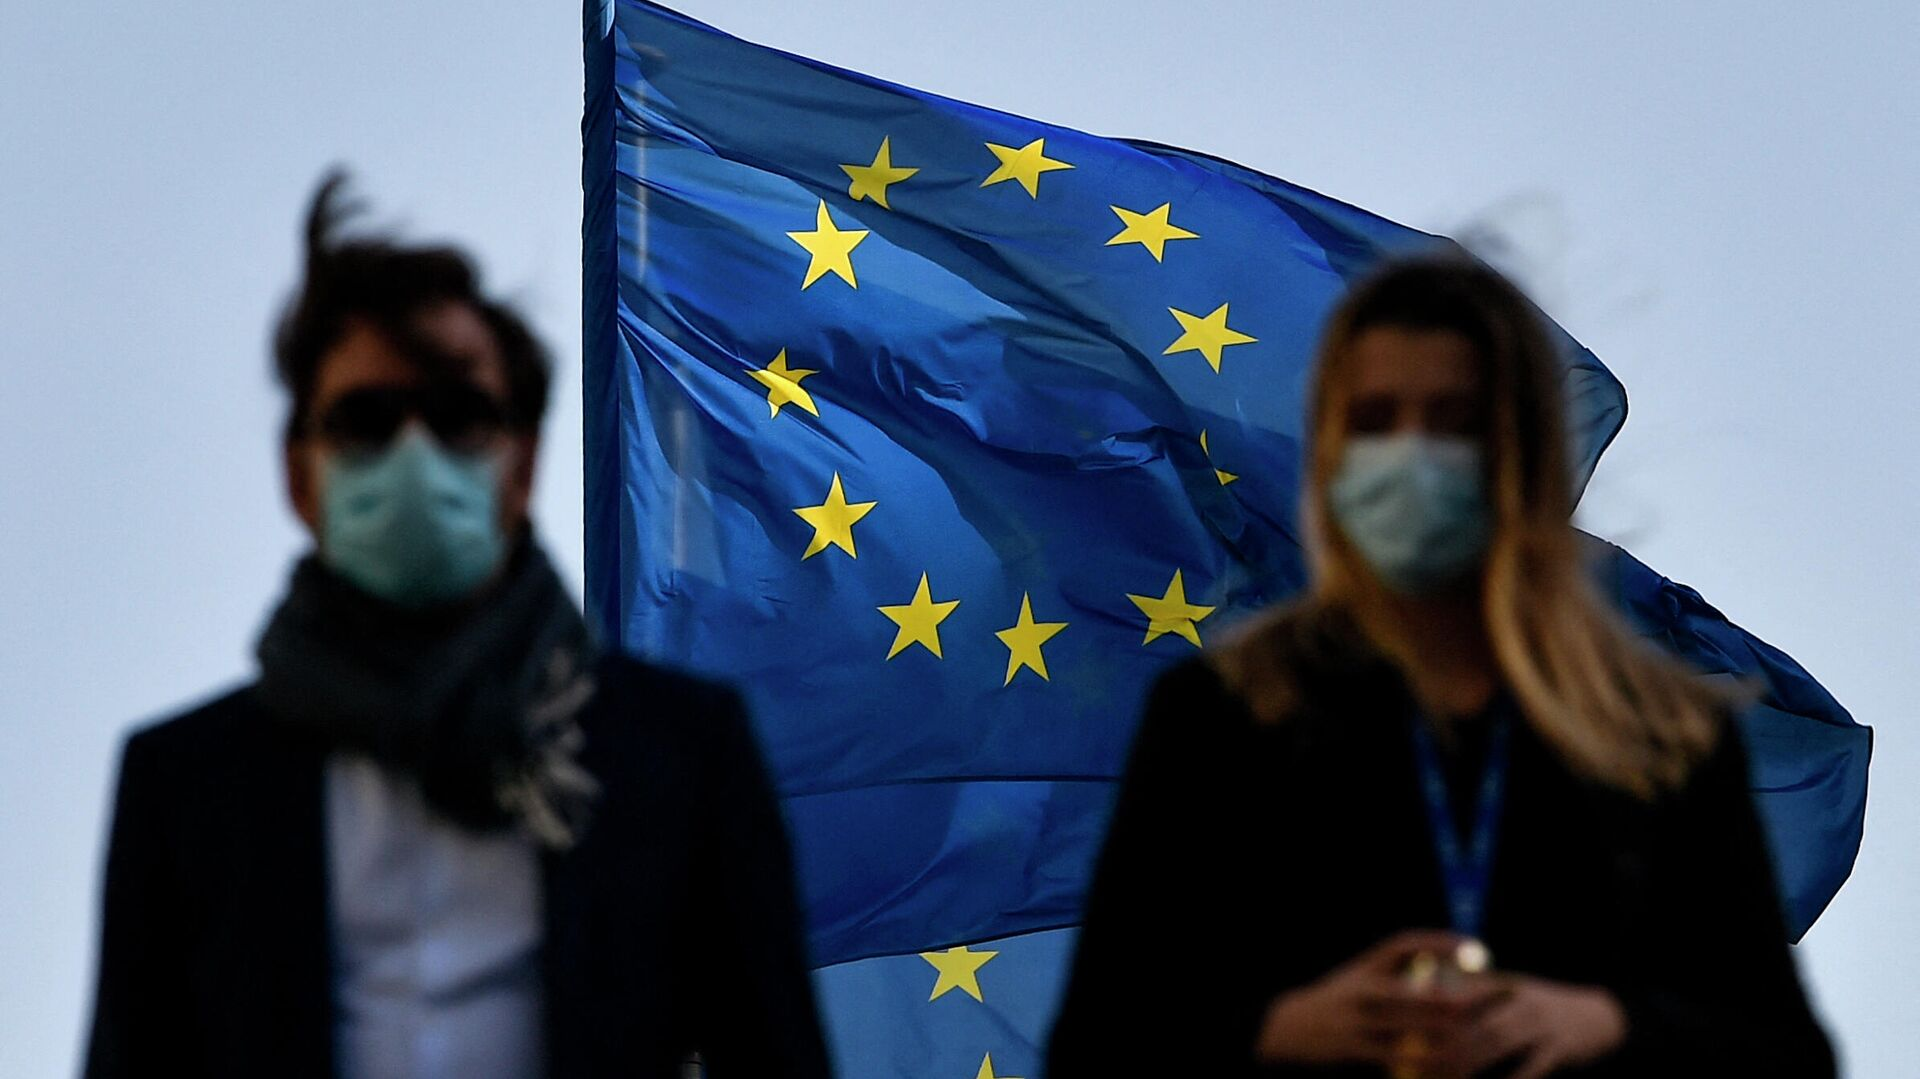 Флаг ЕС в Брюсселе - РИА Новости, 1920, 04.03.2021